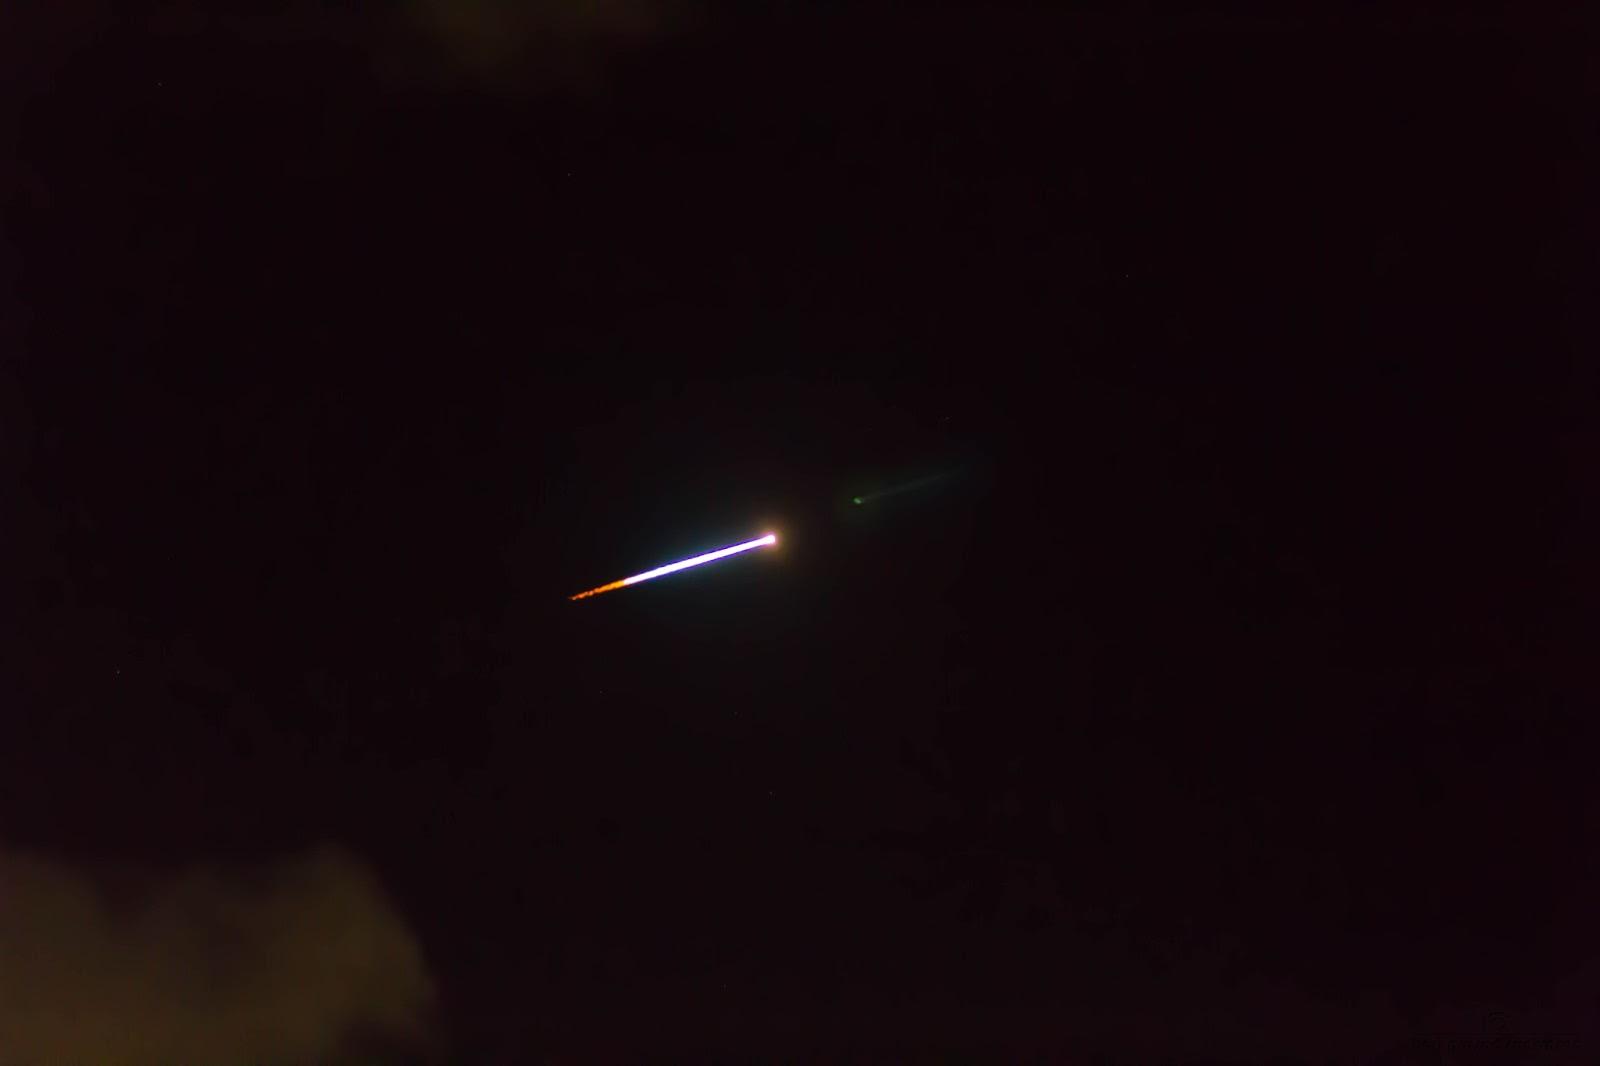 Image 1 - Meteor - Chennai, India, 16.October.2014 1.36 am IST